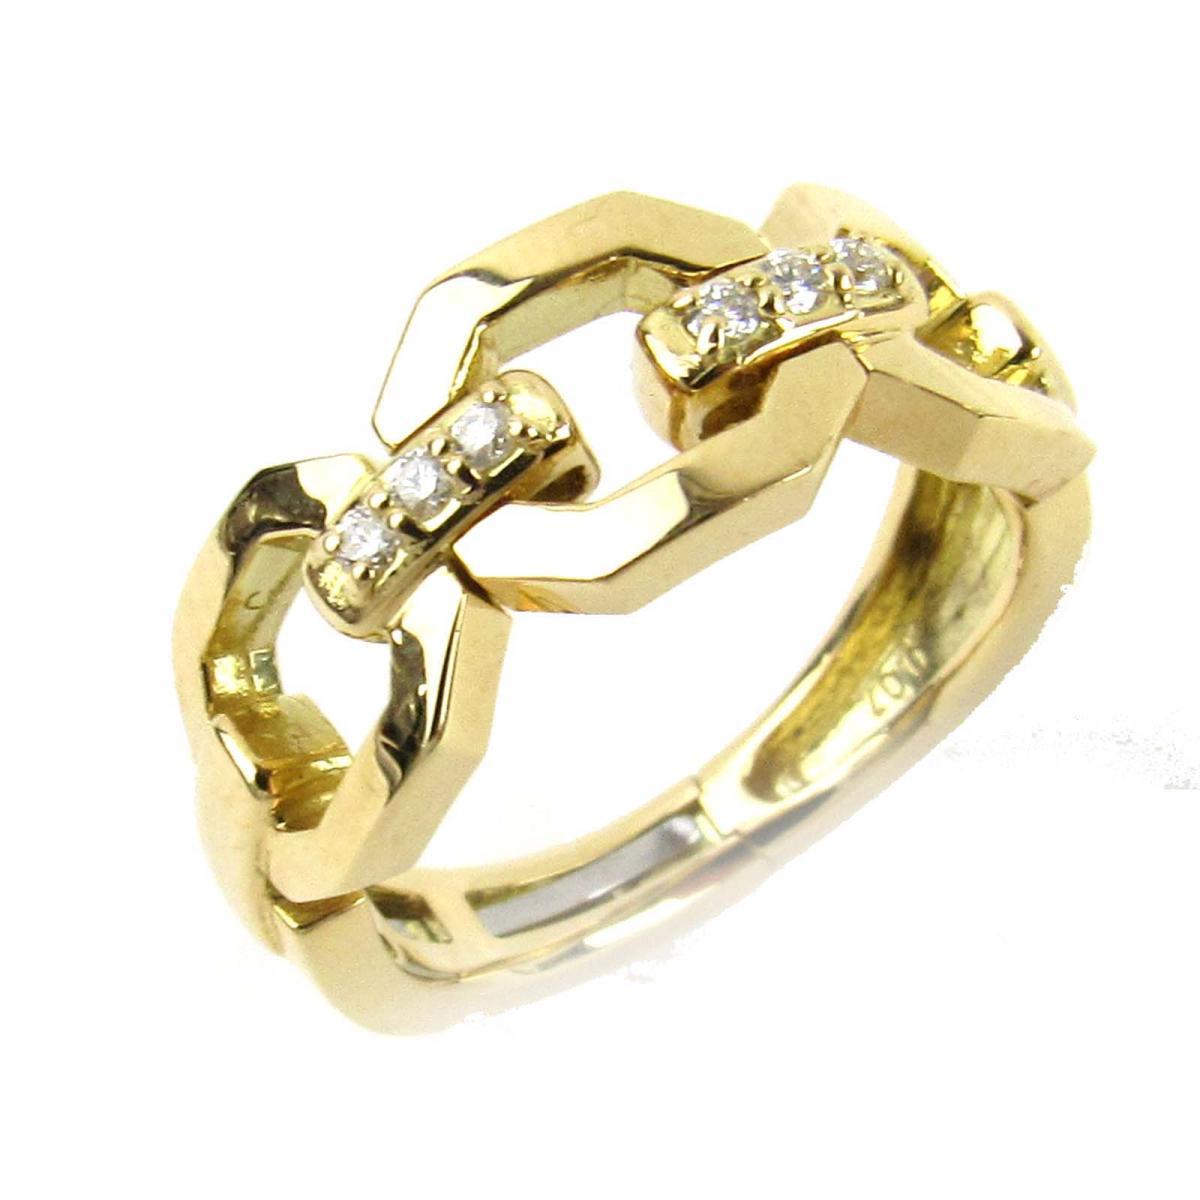 9cd5e2fa98ce ... ダイヤモンド リング 指輪 ノーブランドジュエリー レディース K18YG (750) イエローゴールドxダイヤモンド | | JEWELRY  BRANDOFF ブランドオフ アクセサリー